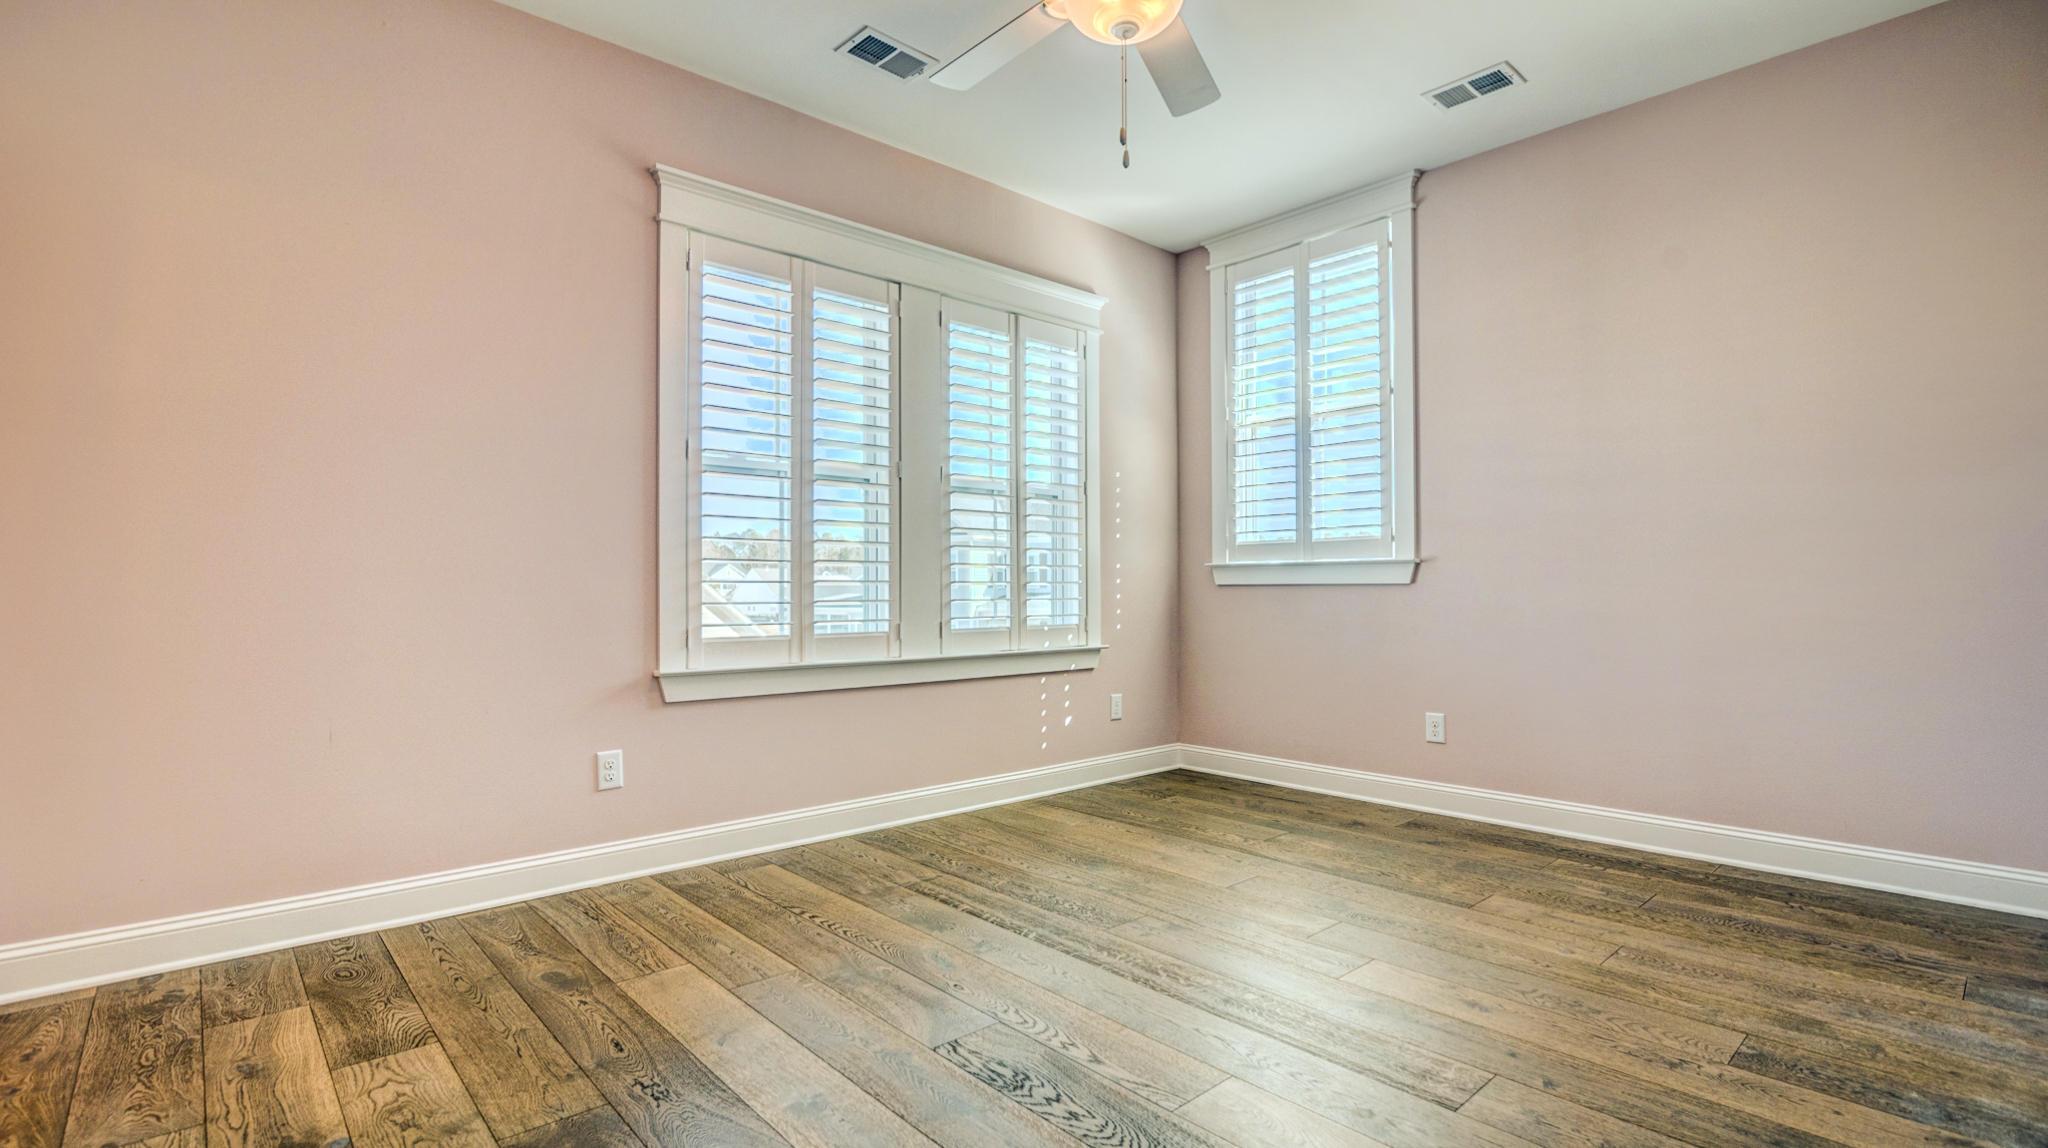 Carolina Park Homes For Sale - 3687 Spindrift, Mount Pleasant, SC - 29